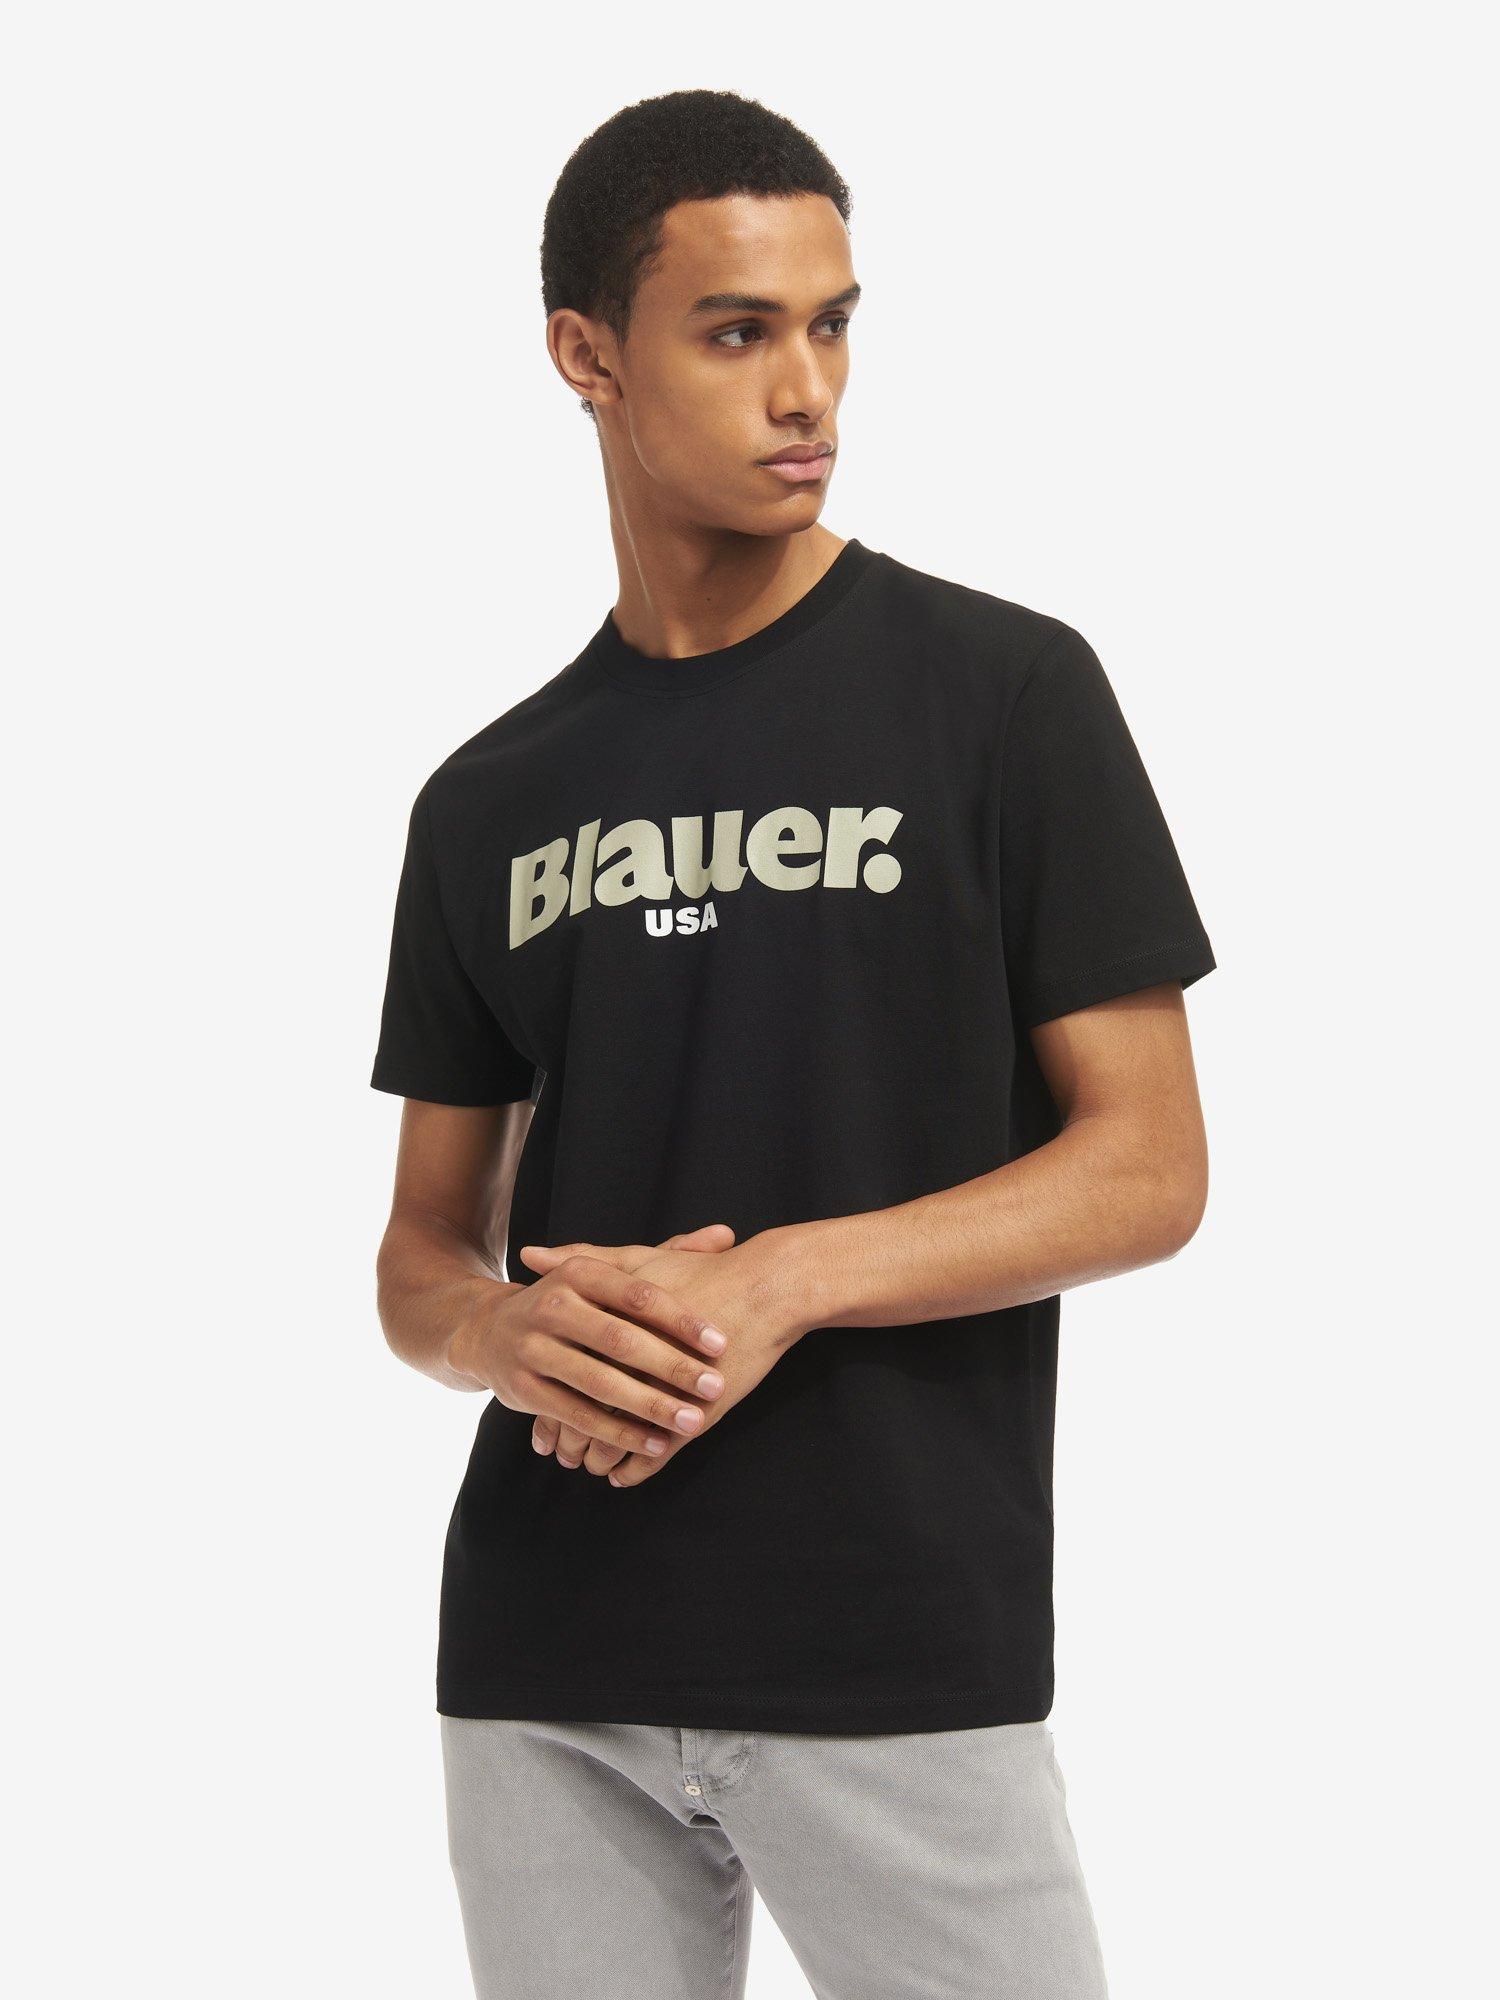 Blauer - BLAUER USA T-SHIRT - Black - Blauer